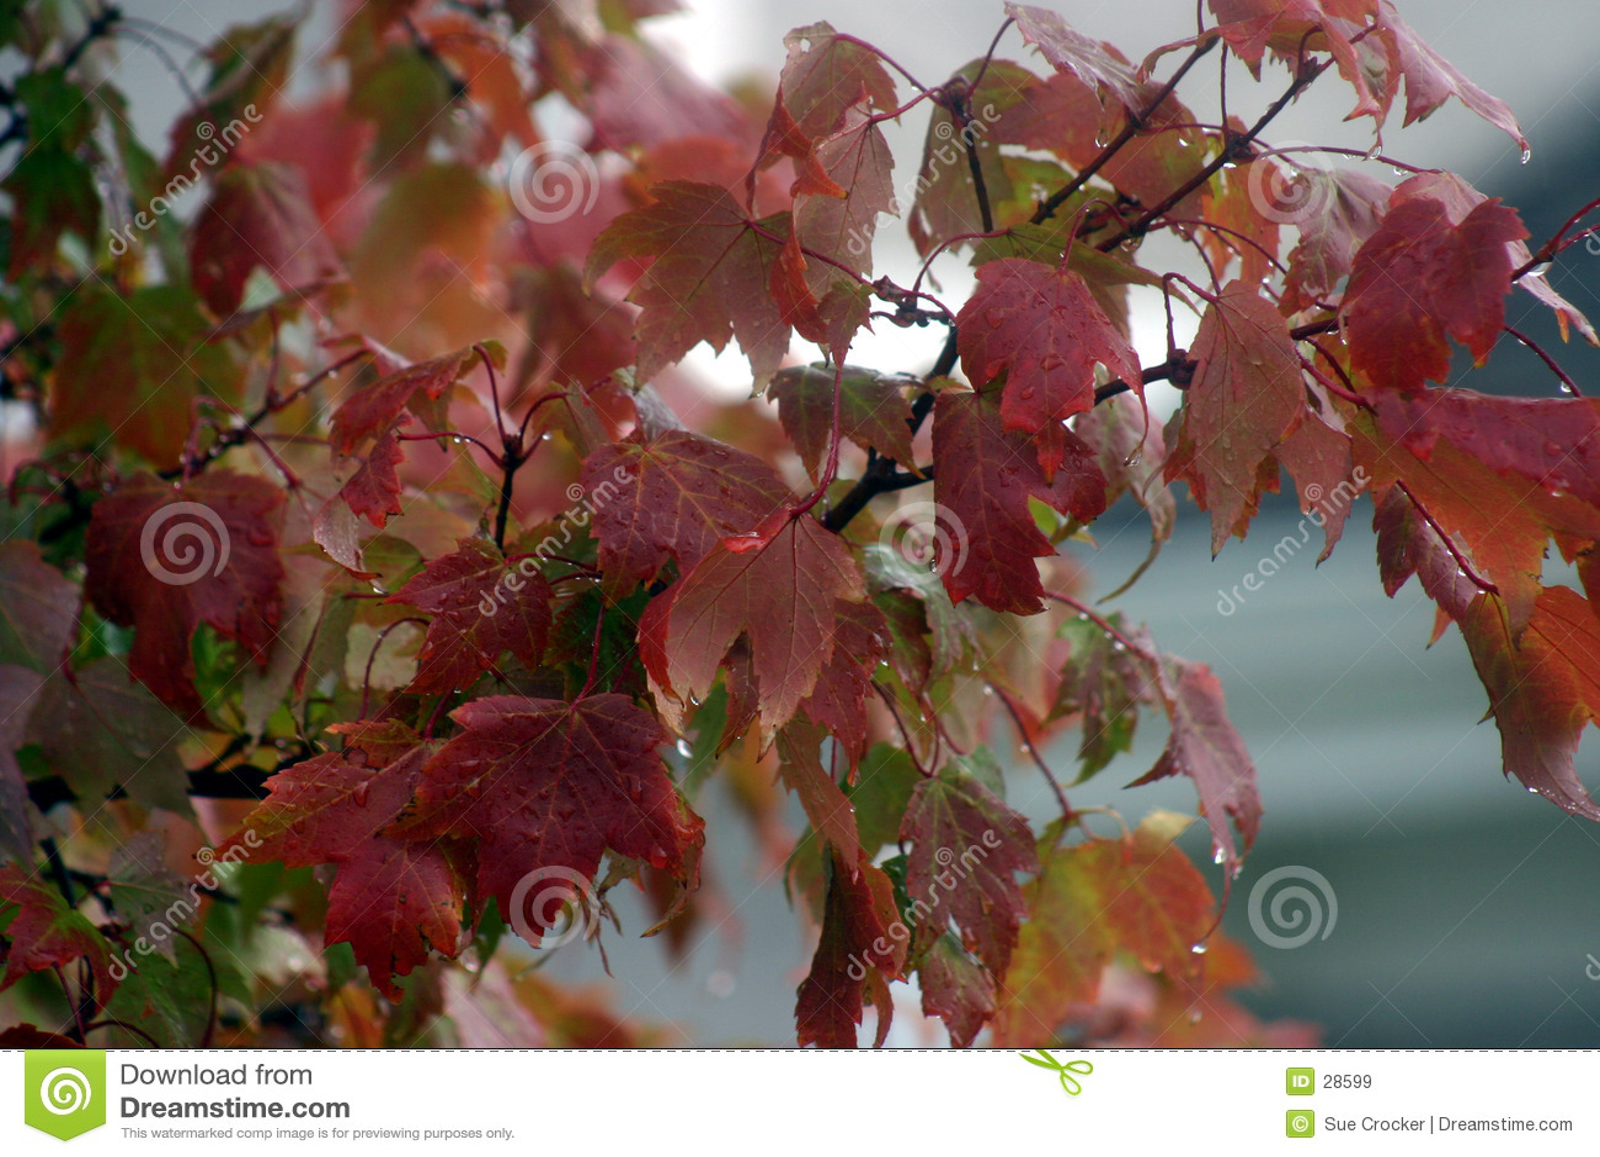 Herbst-Blätter im Regen